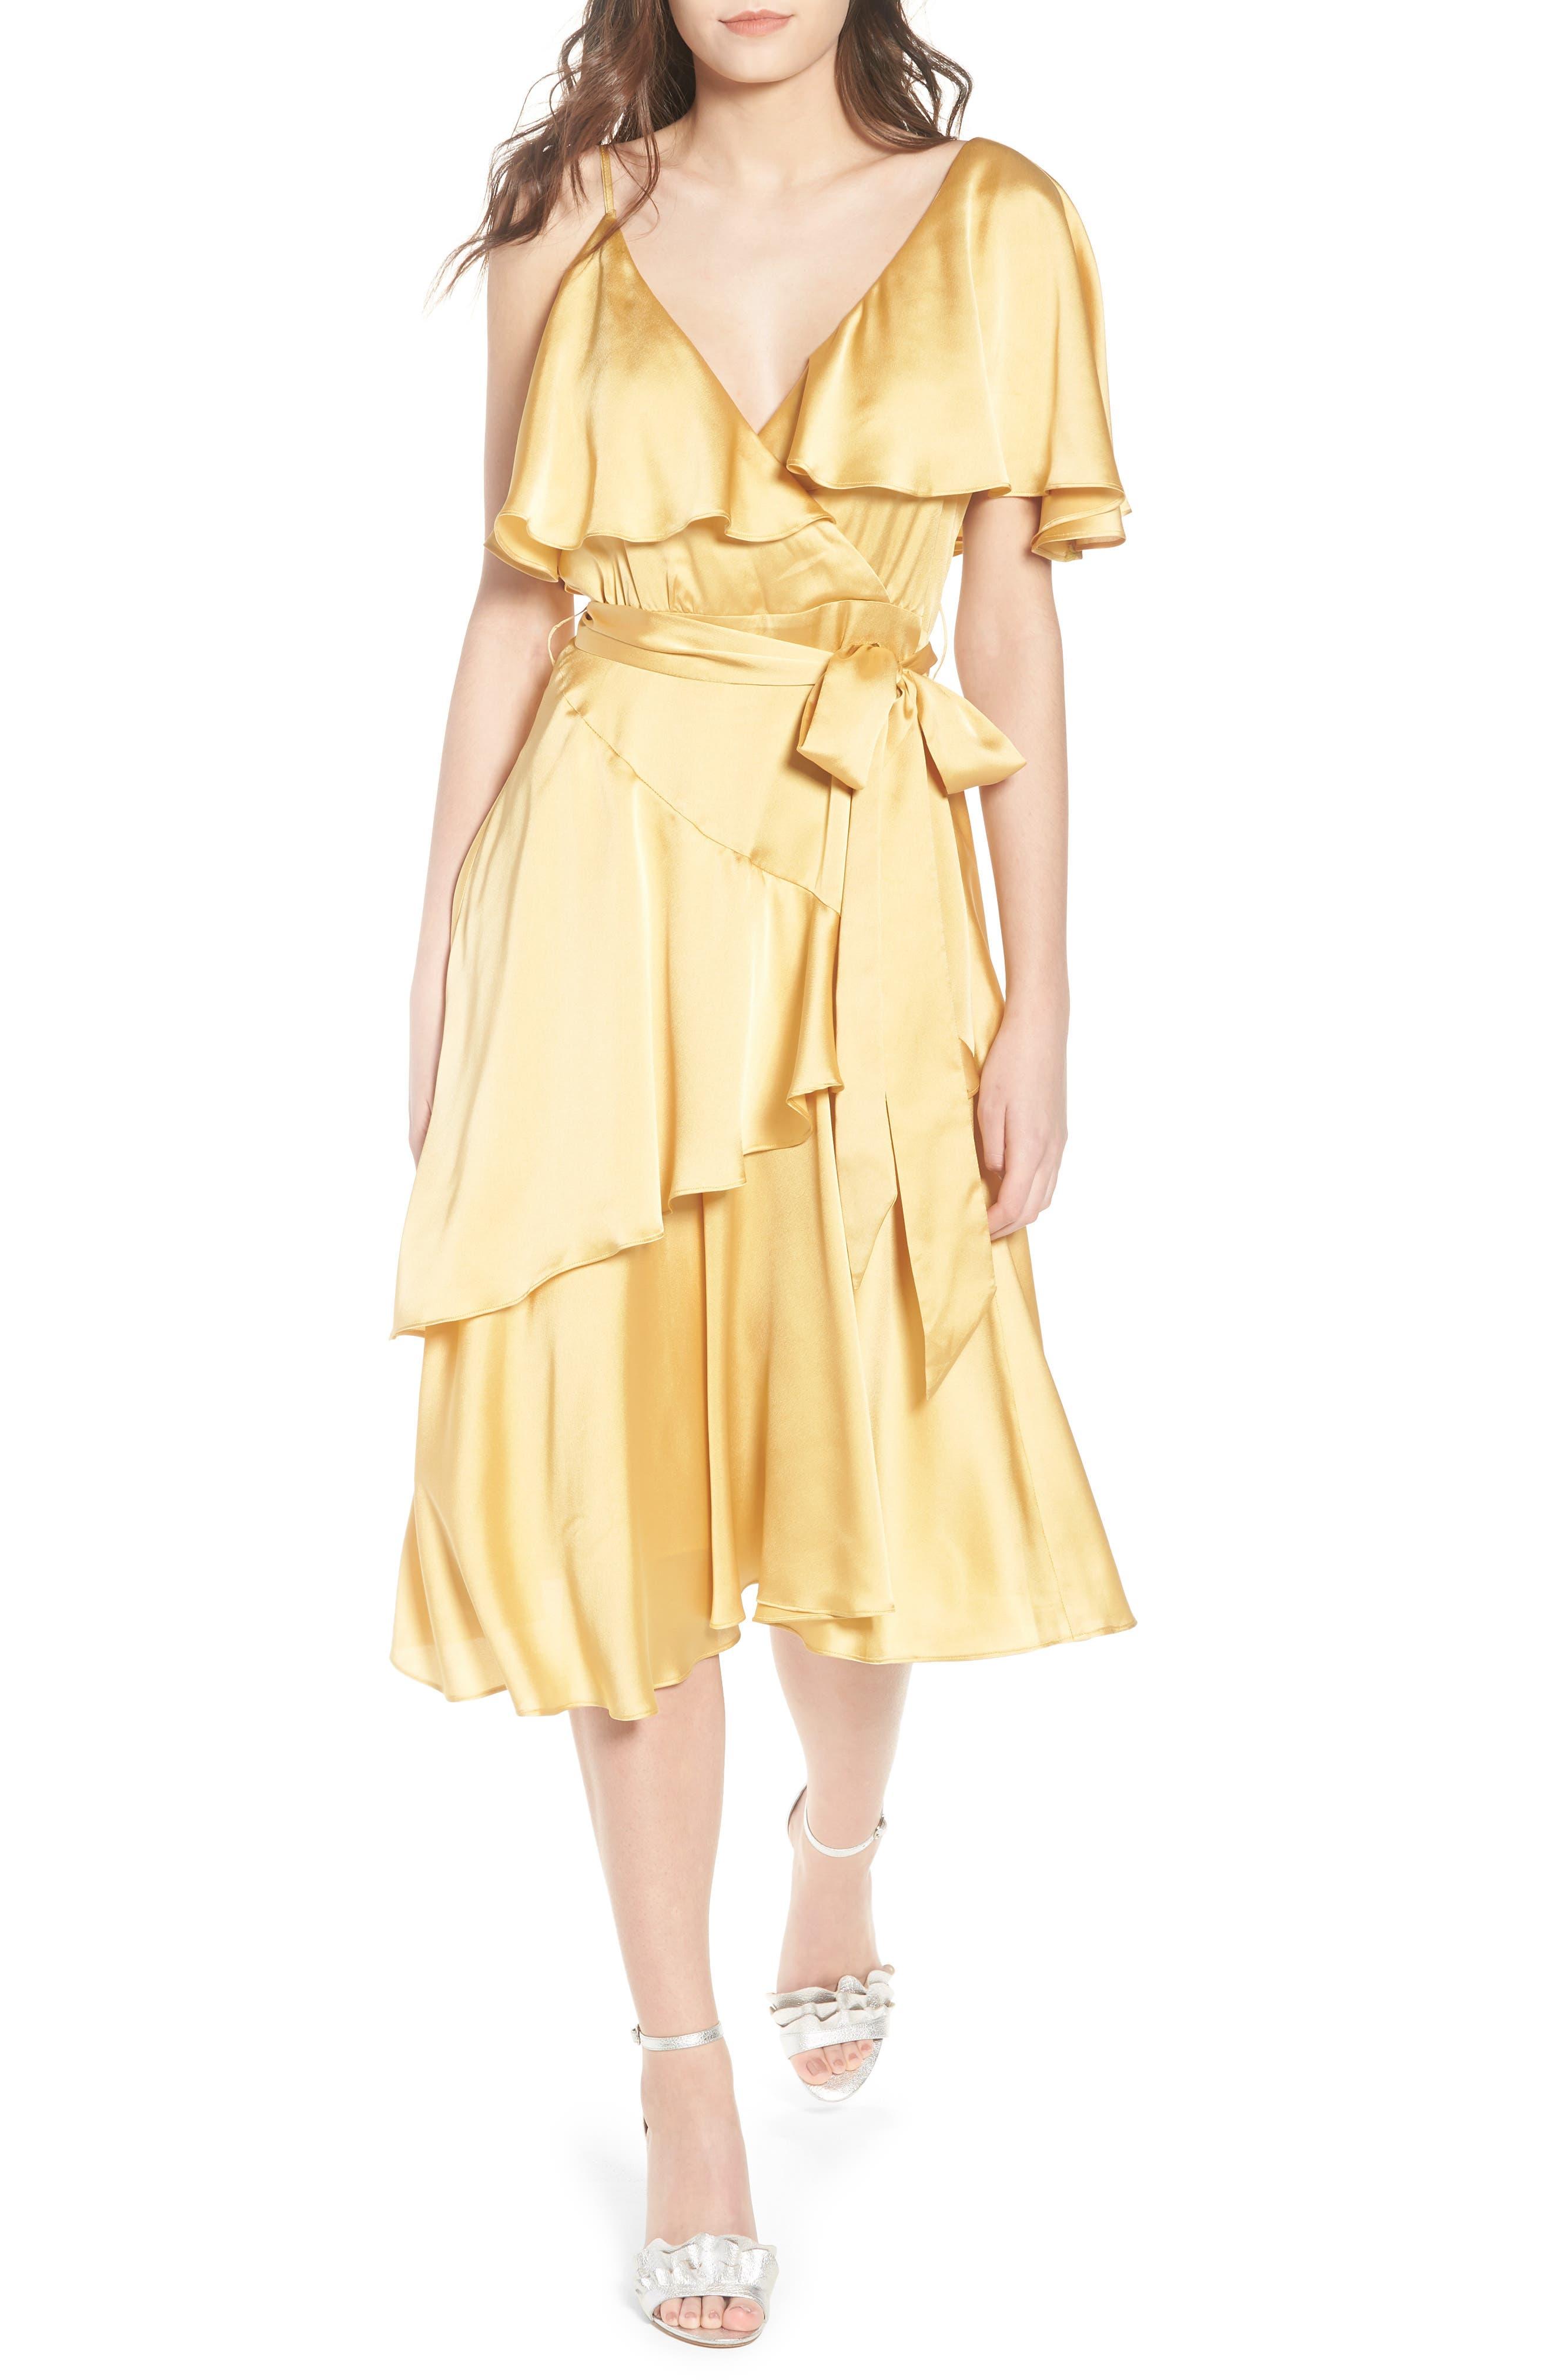 Deconstructed Tea Dress,                         Main,                         color, Yellow